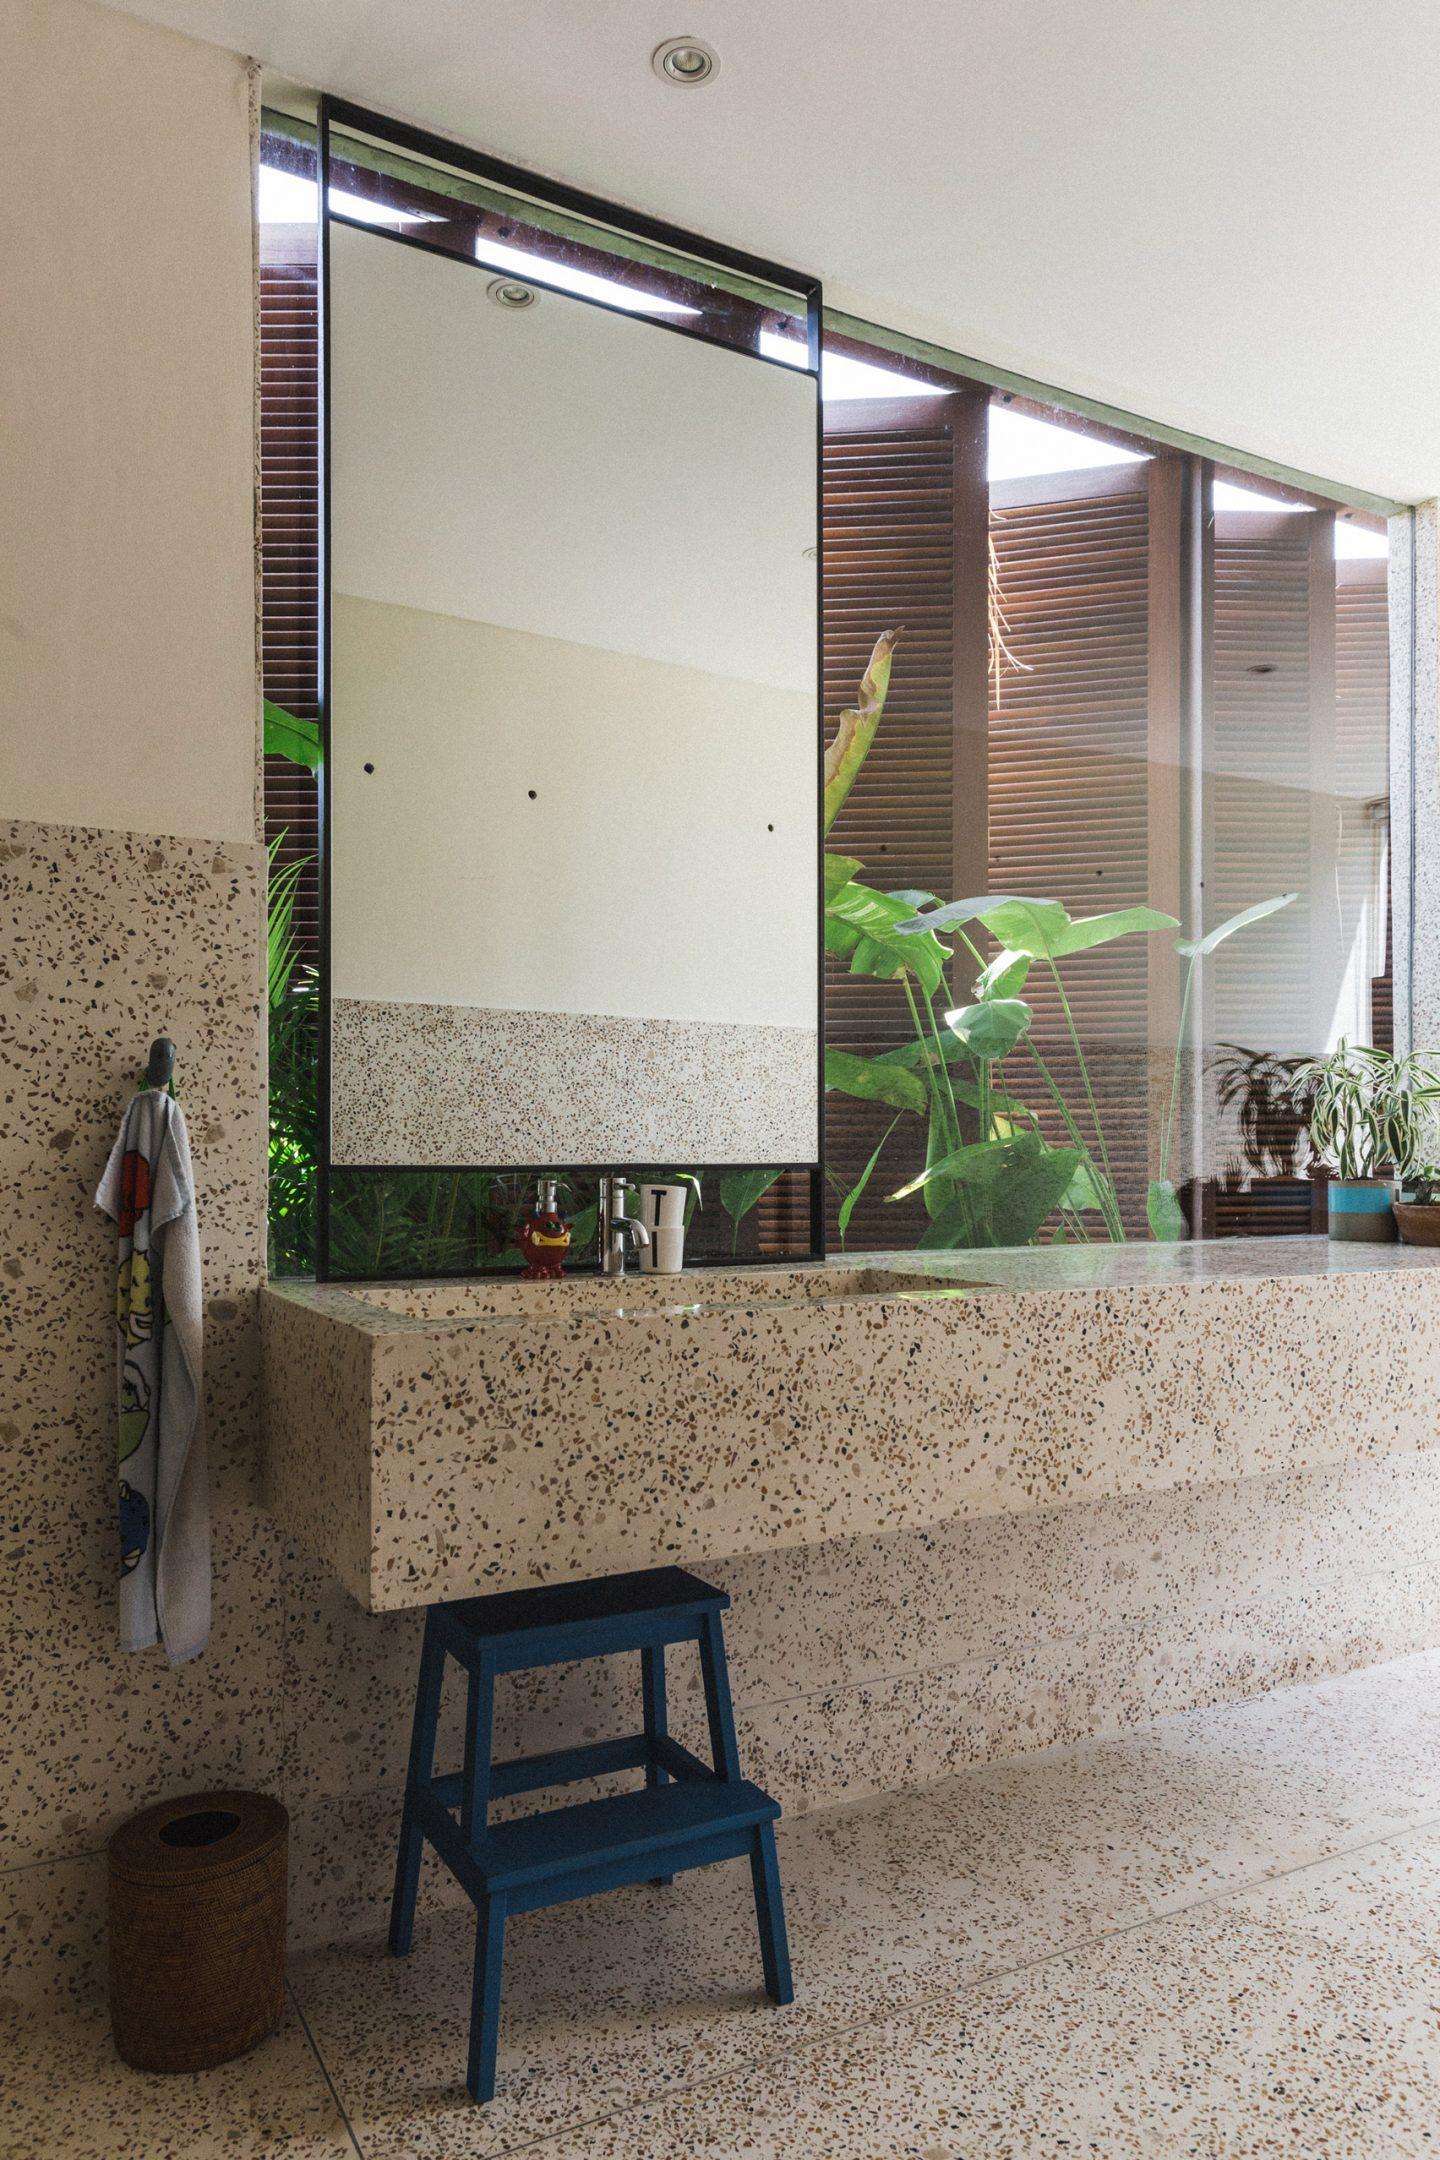 IGNANT-Architecture-Patisandhika-Daniel-Mitchell-Indonesia-Brutalist-Home-2